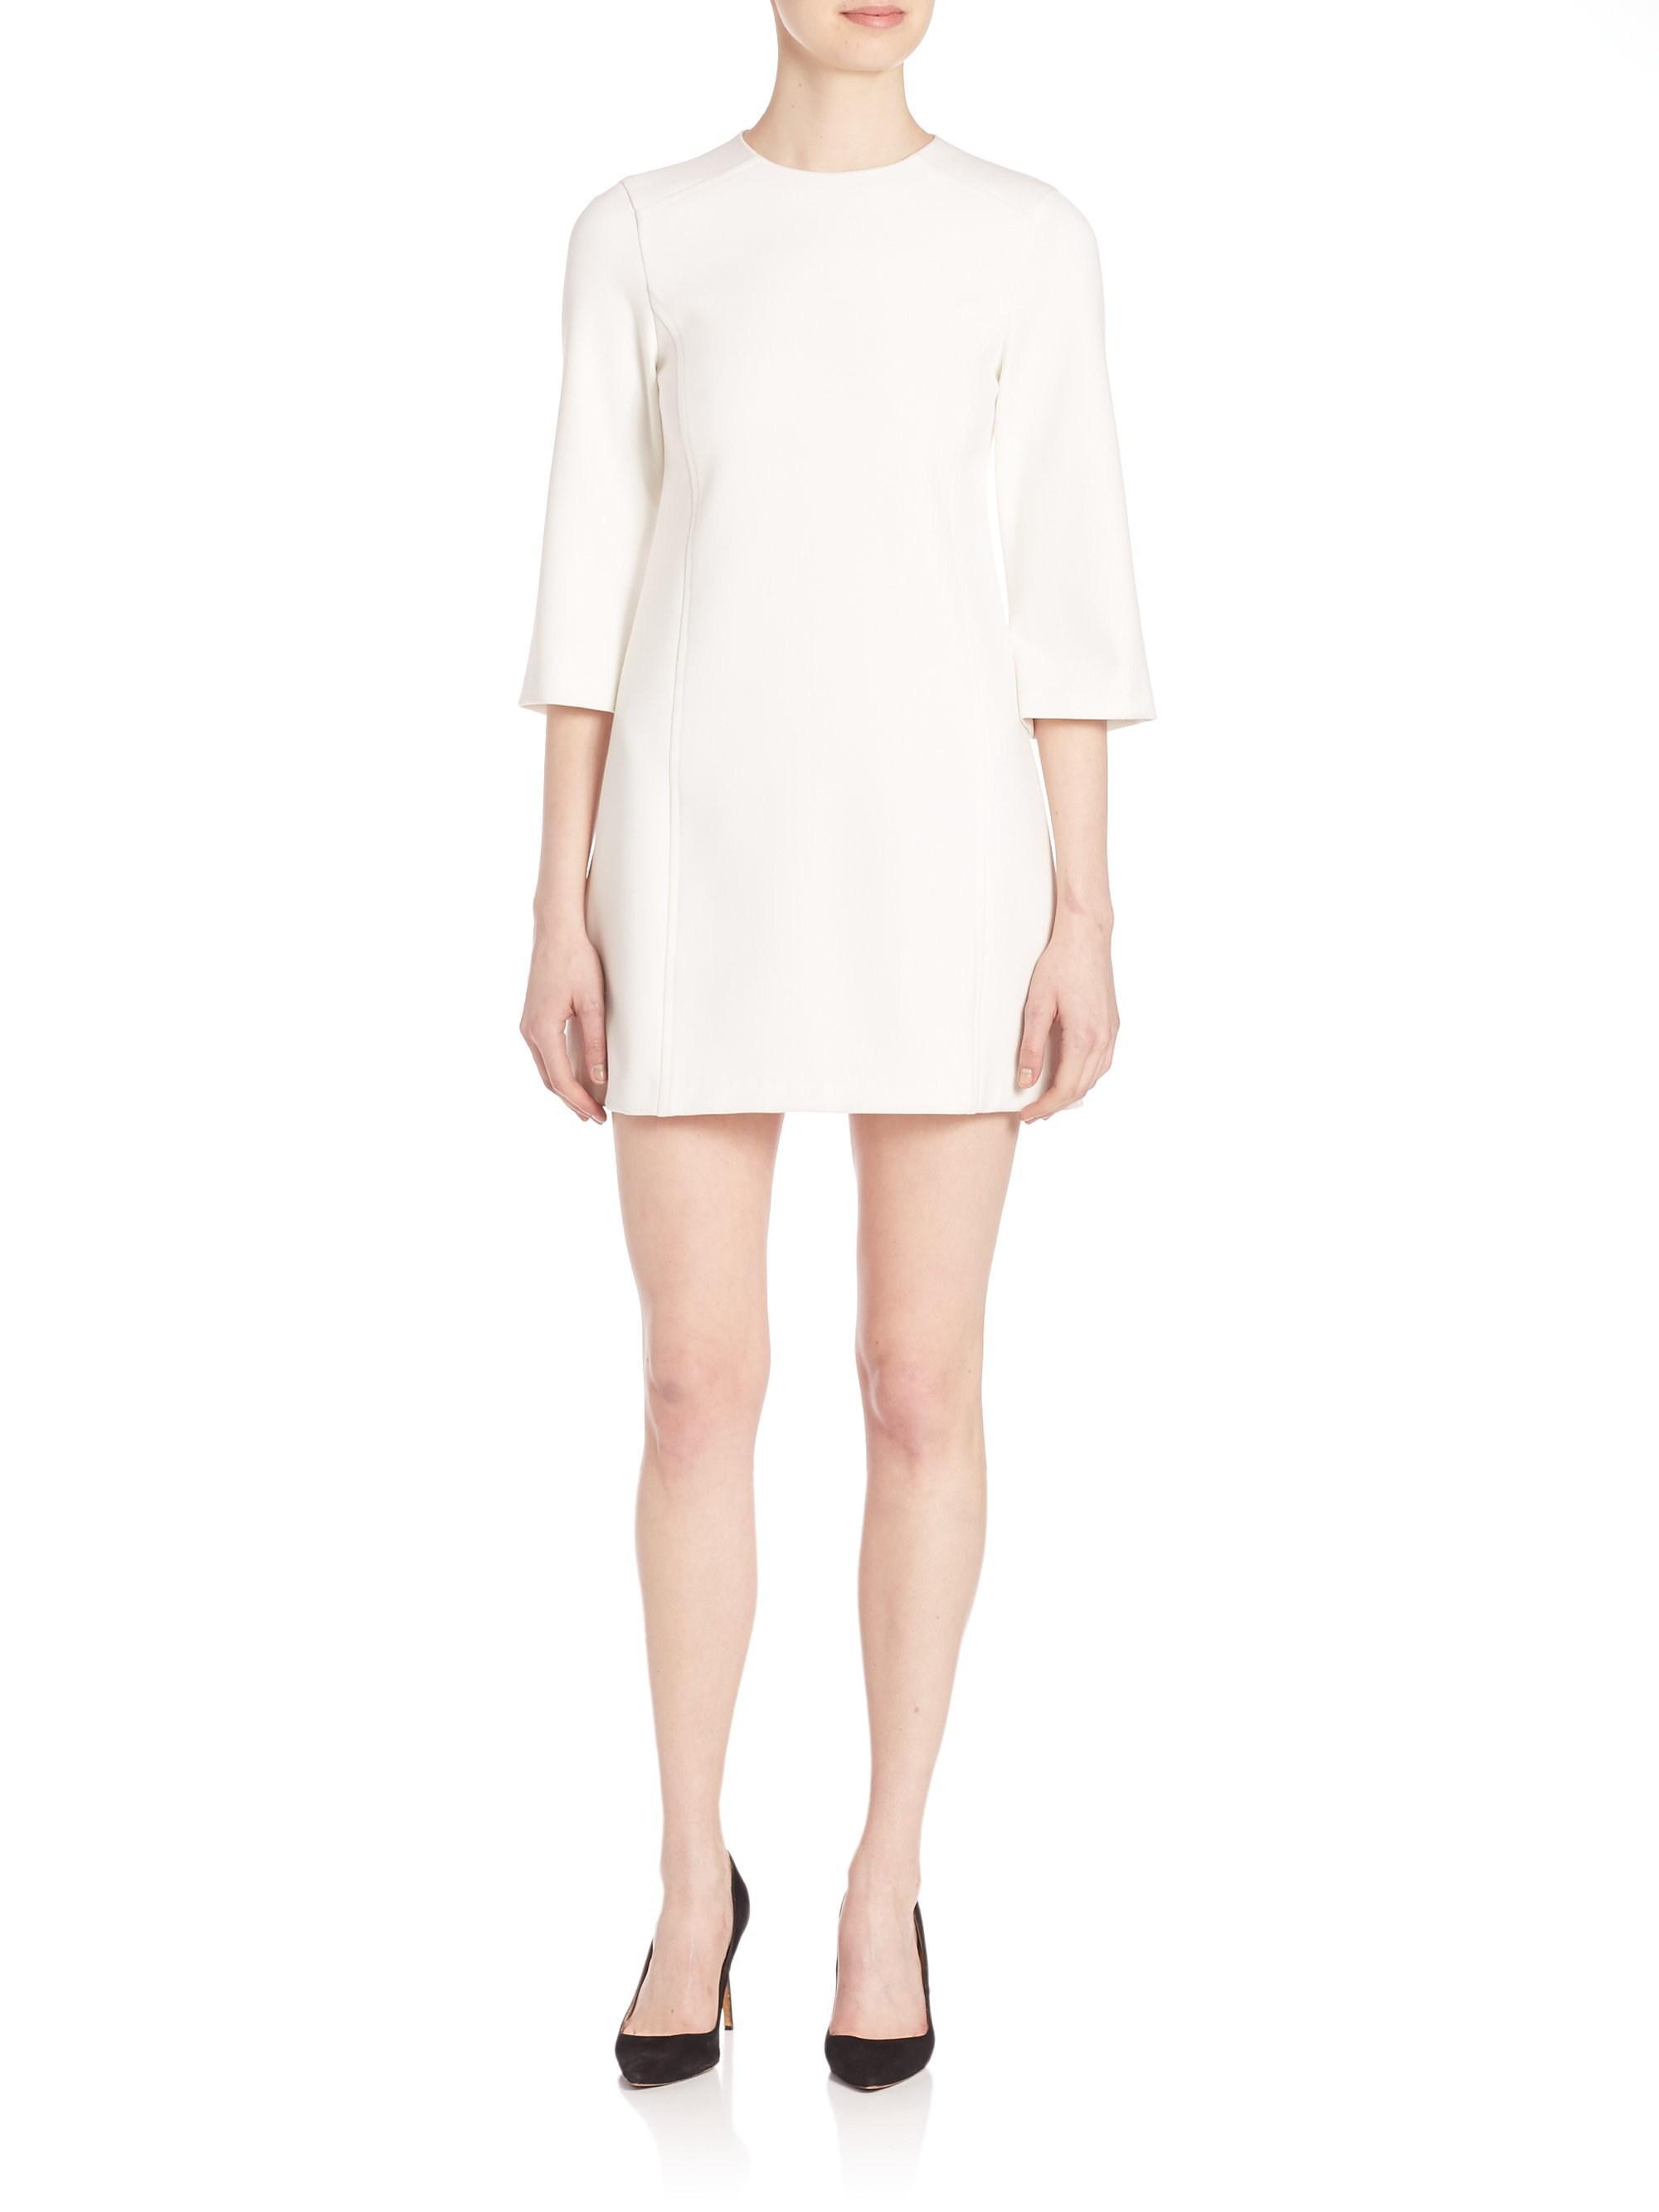 79214405895 Alice + Olivia Women s Gem Shift Dress - Off White - Size 12 in ...